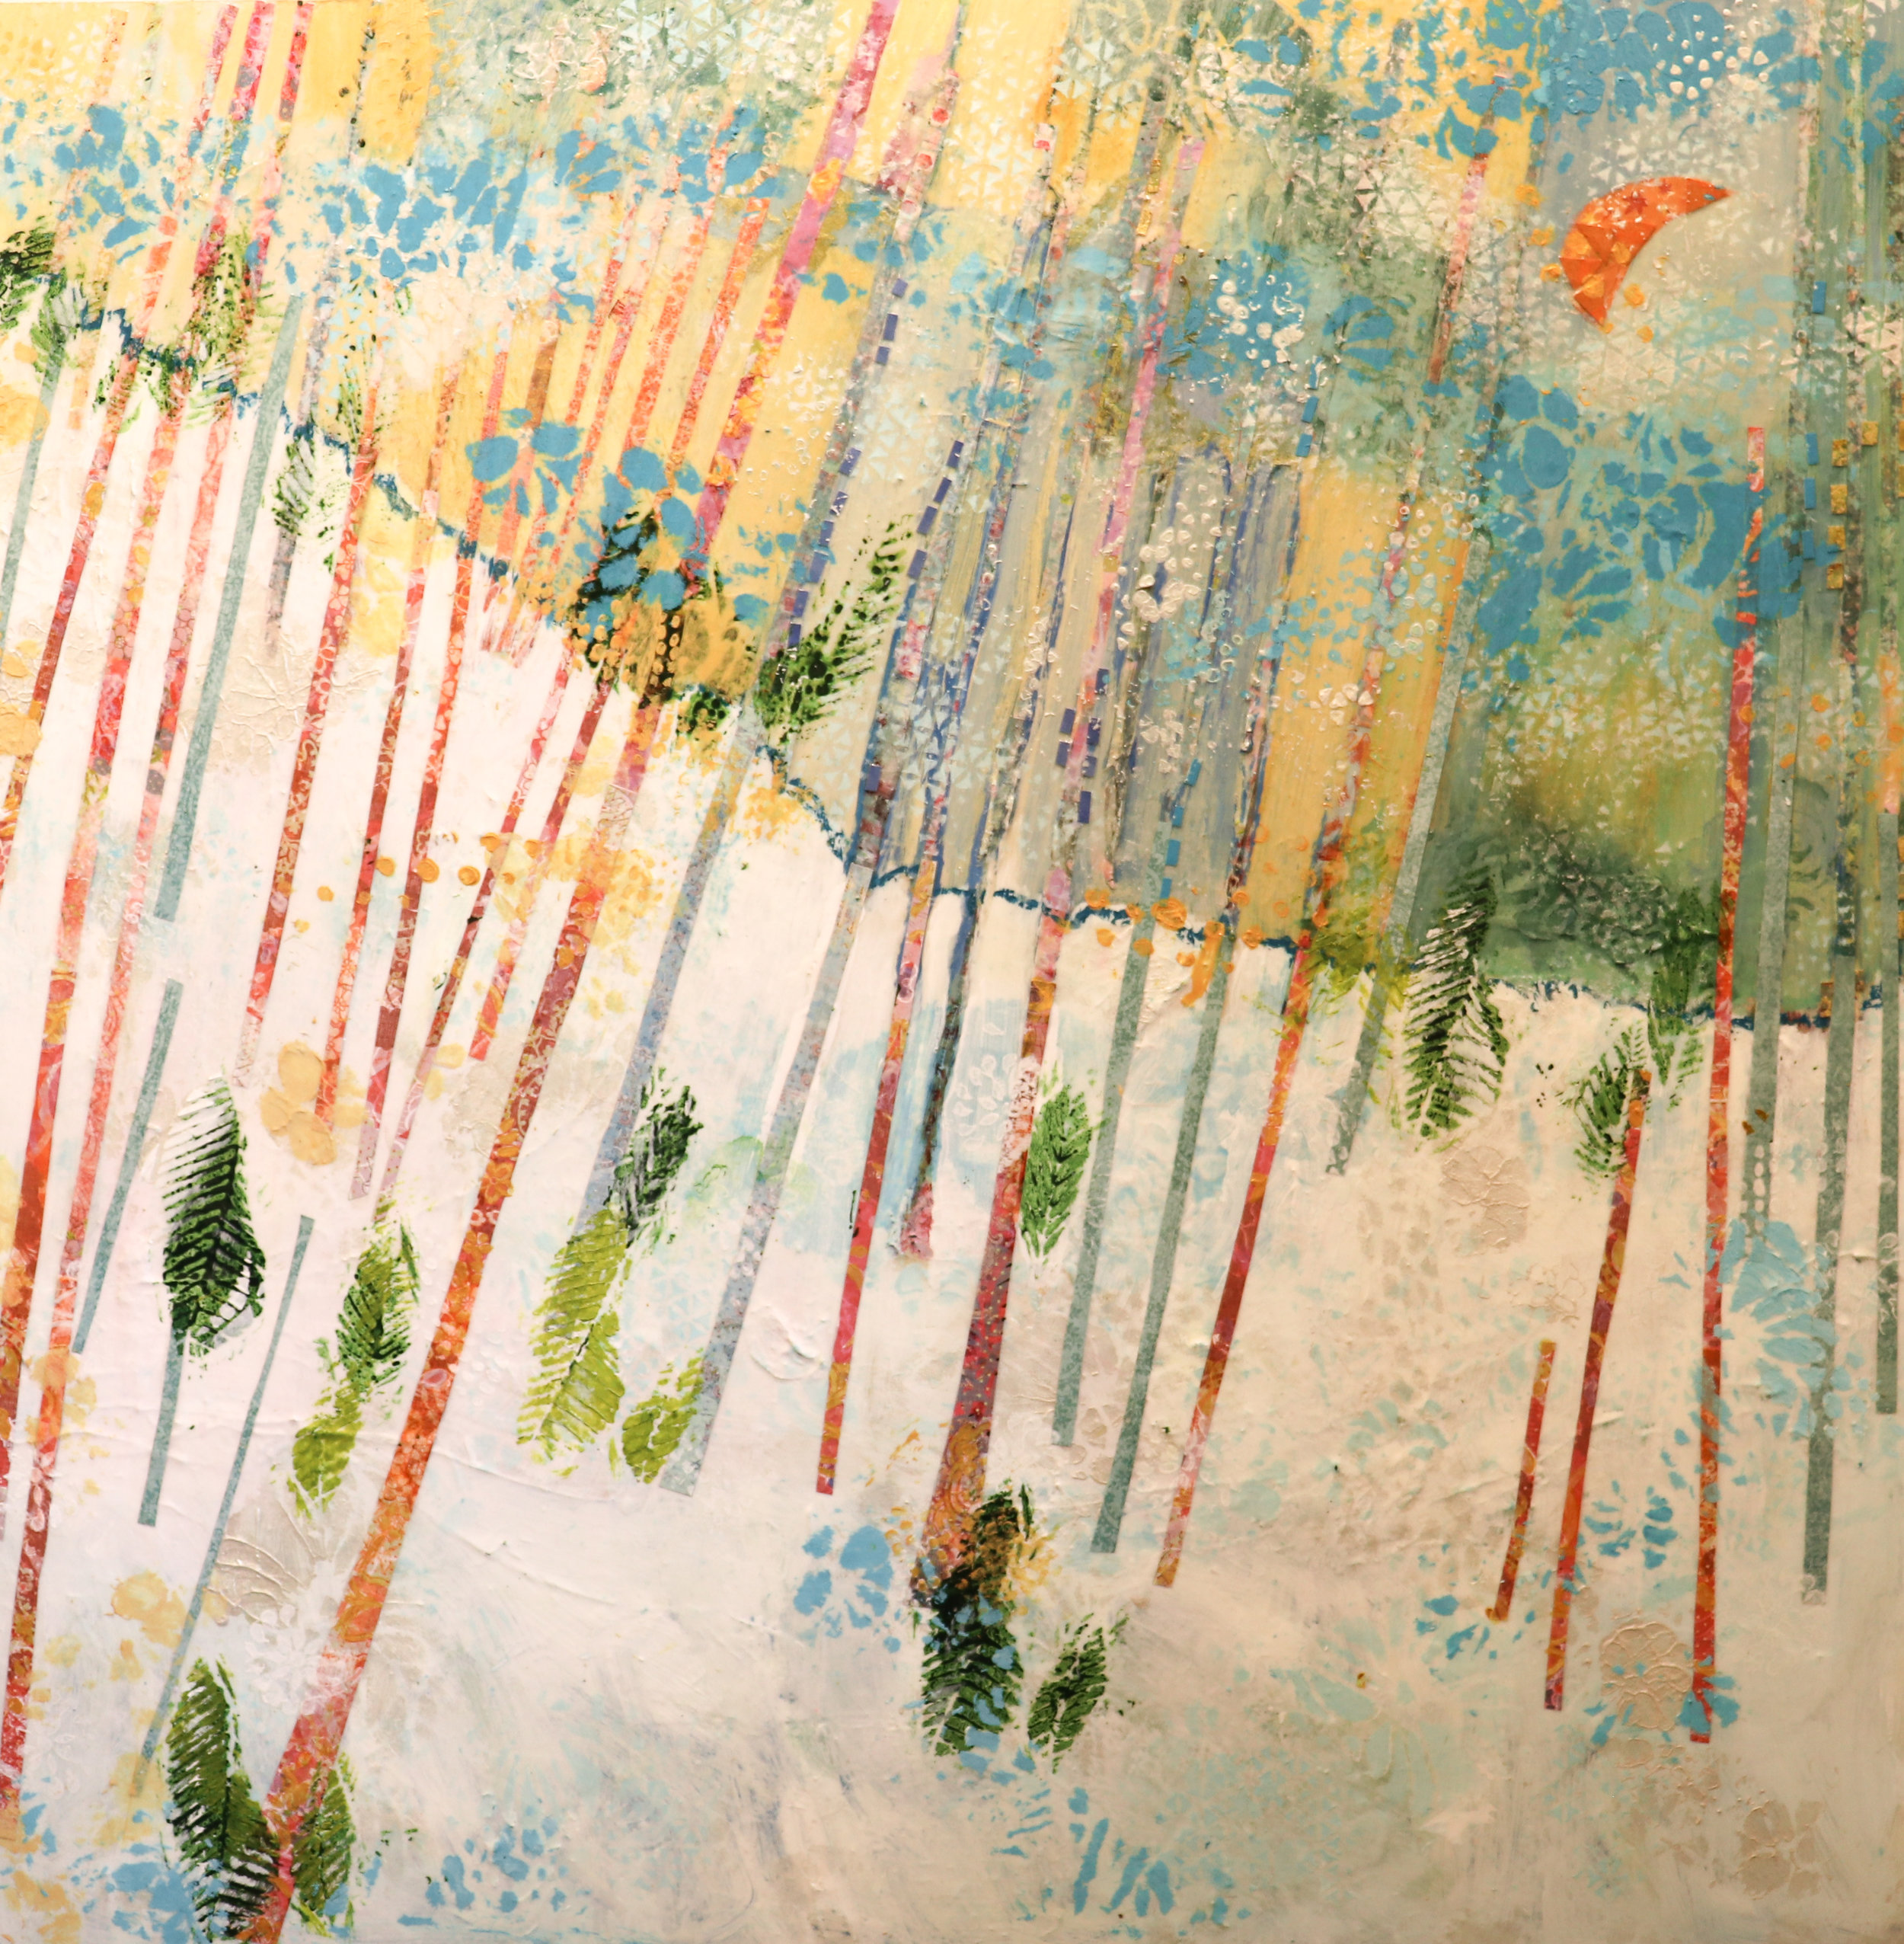 - Tangerine Moon w/Teal Line (36x36) $3200